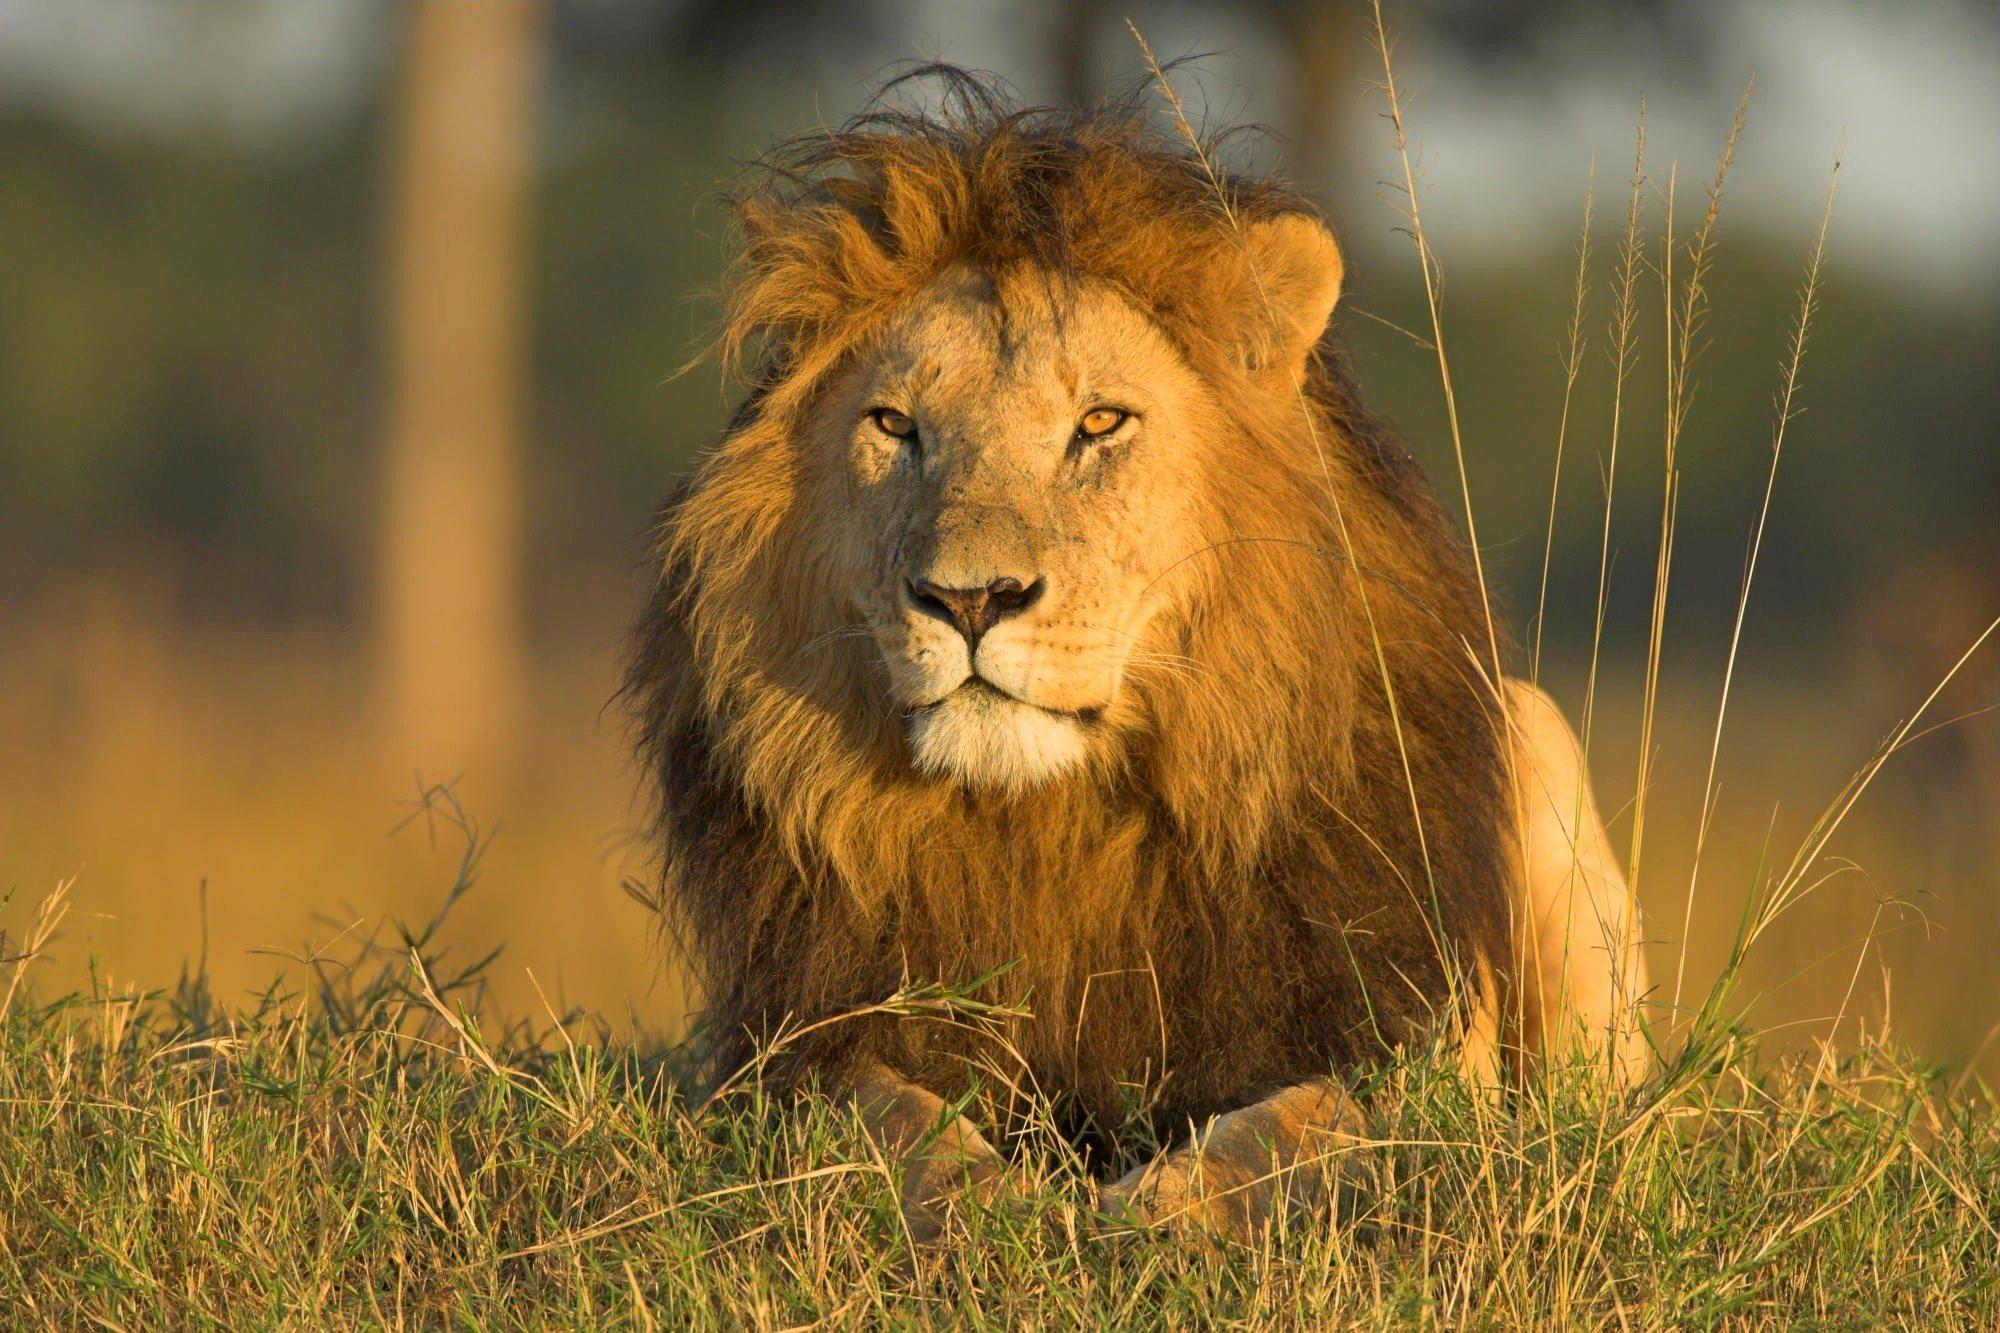 Beauty Cute Amazing Animal Lion In Jungle Wallpaper